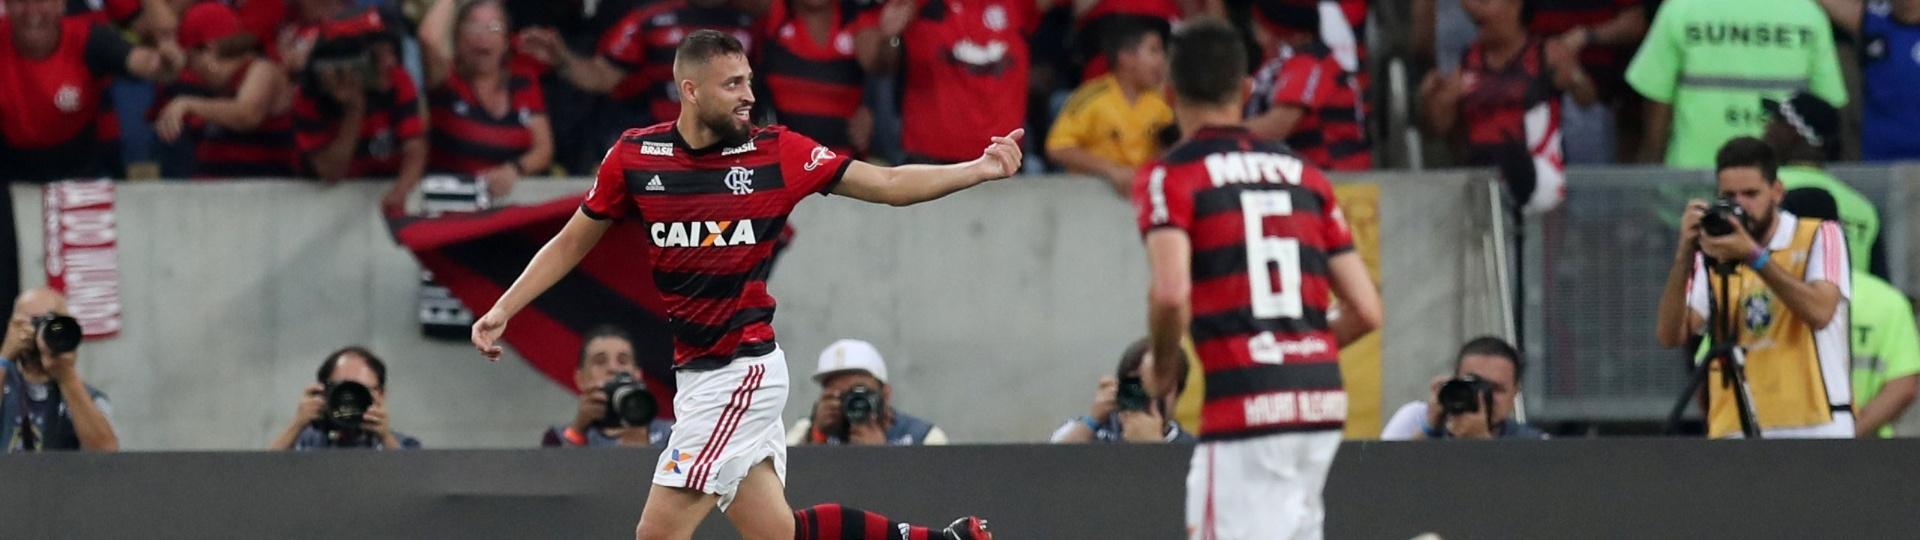 Léo Duarte comemora após marcar o segundo gol do Flamengo sobre o Fluminense